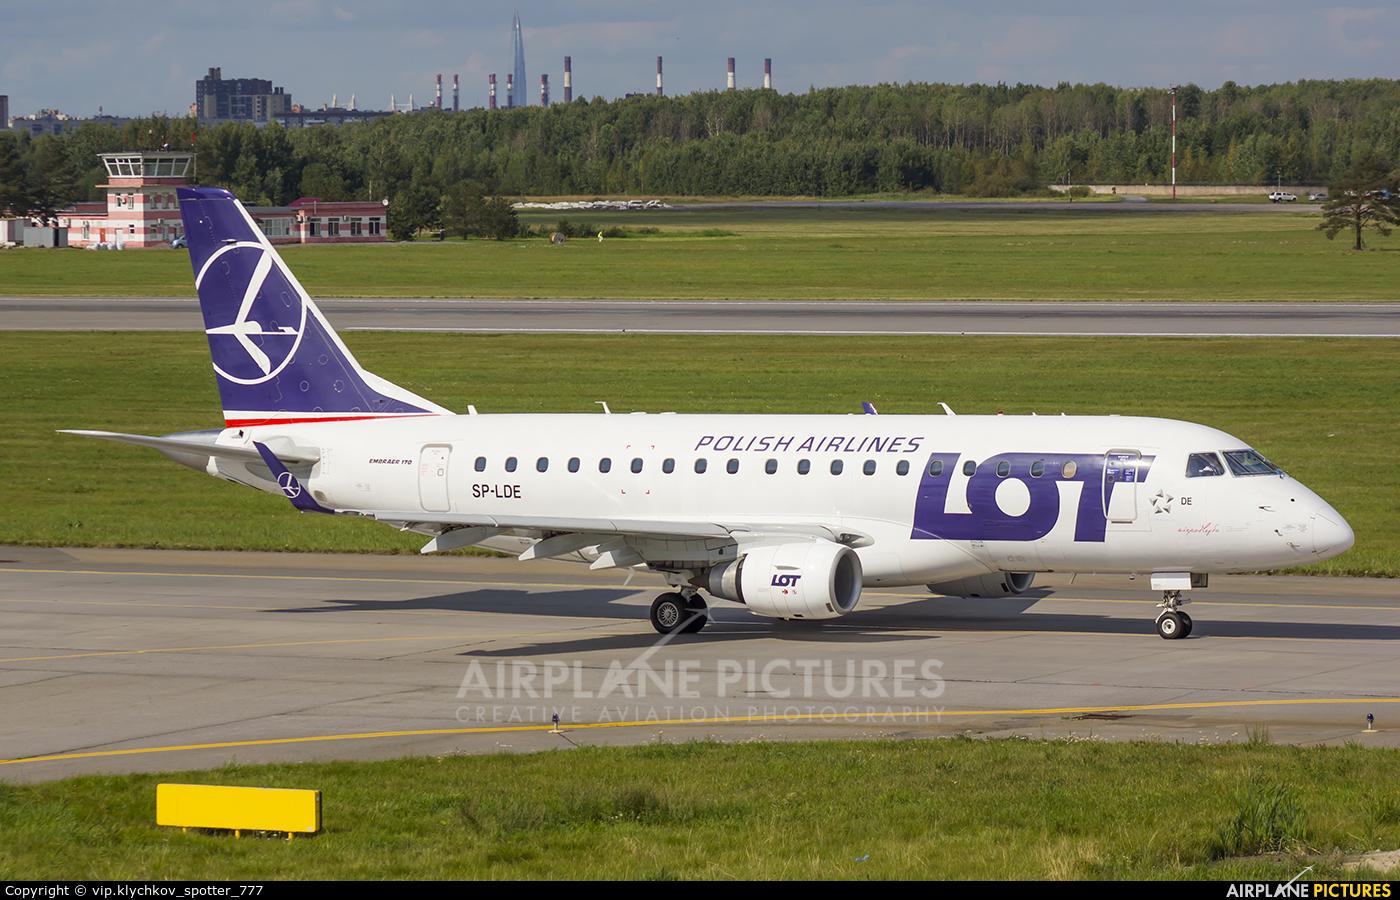 LOT - Polish Airlines SP-LDE aircraft at St. Petersburg - Pulkovo